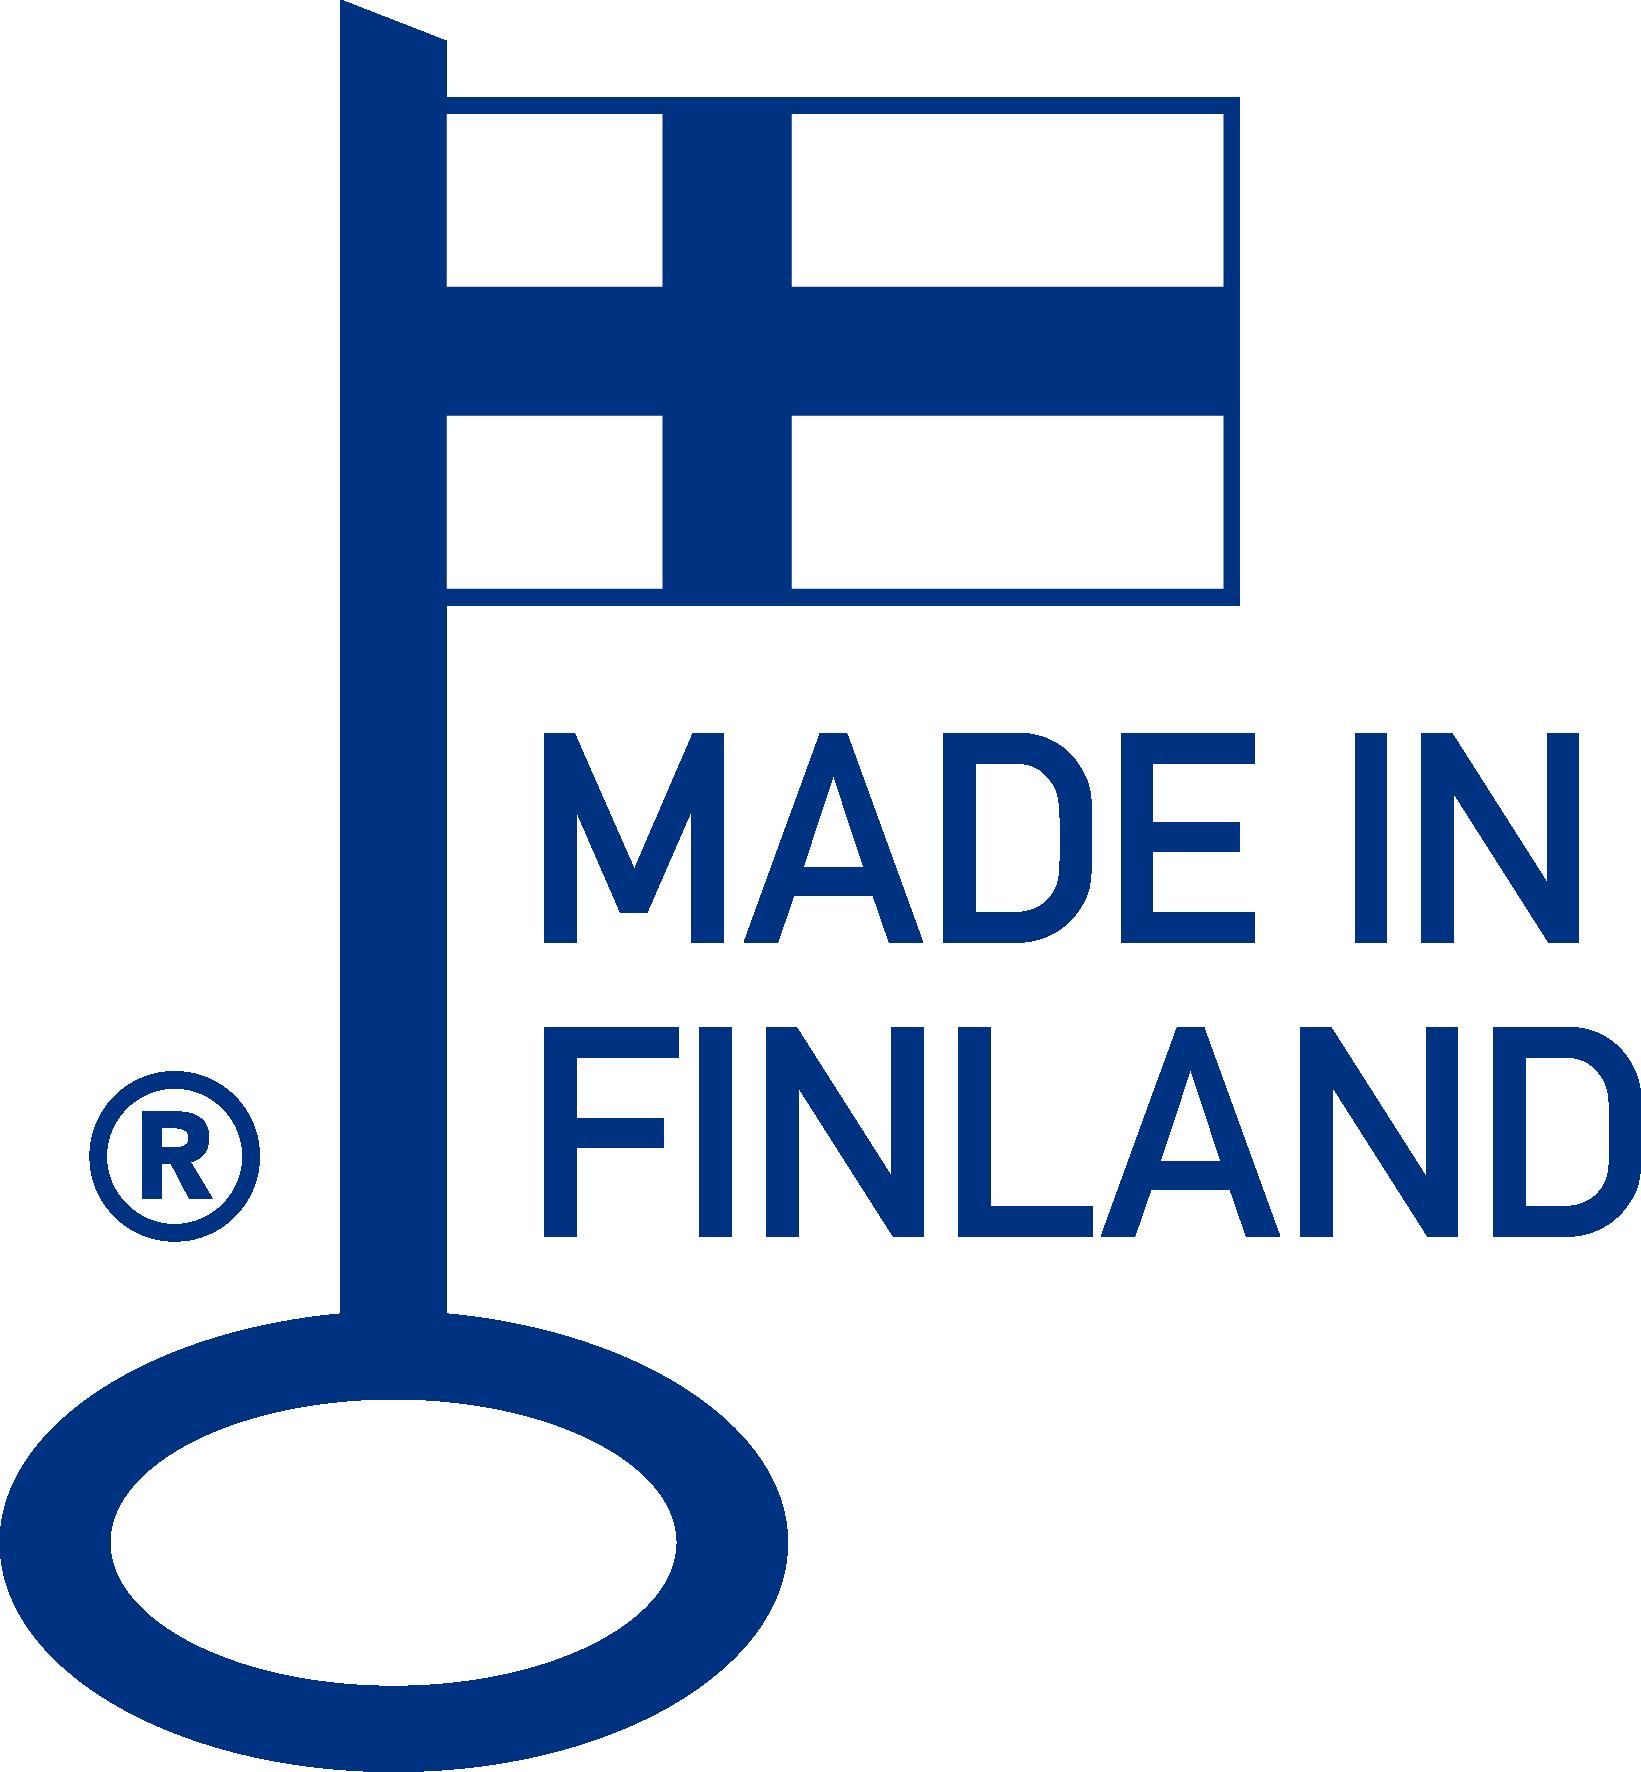 Tehty Suomessa.